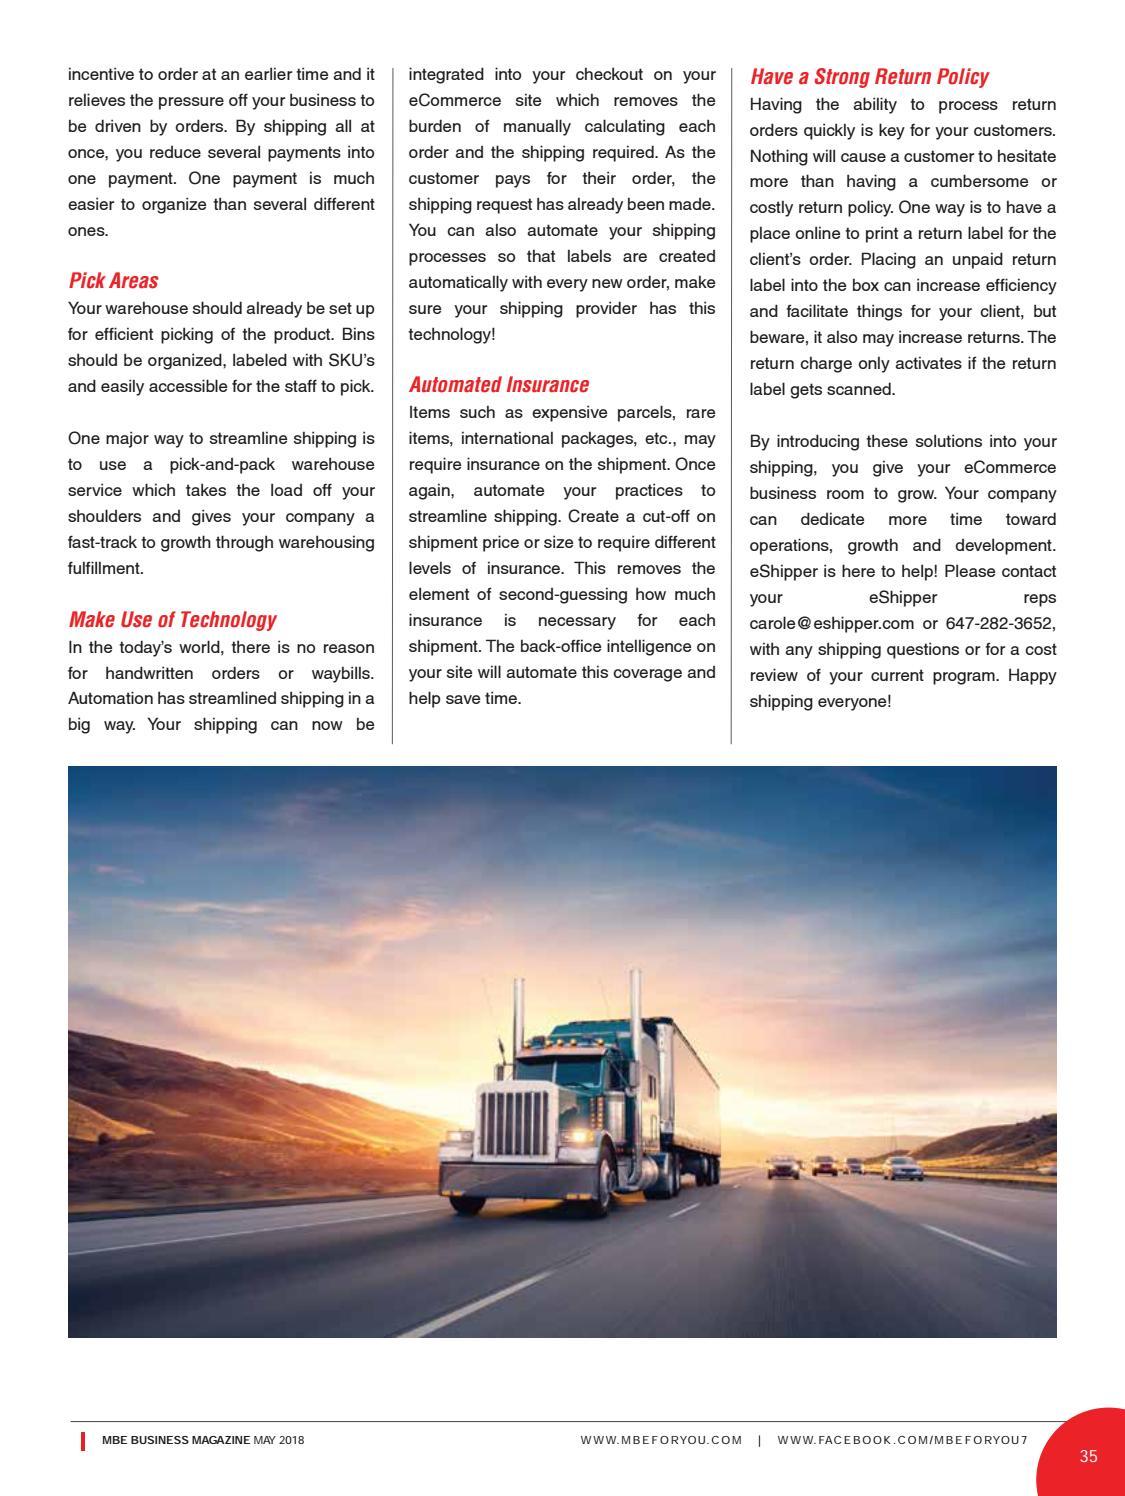 MBE Business Magazine by Ali Raza - issuu